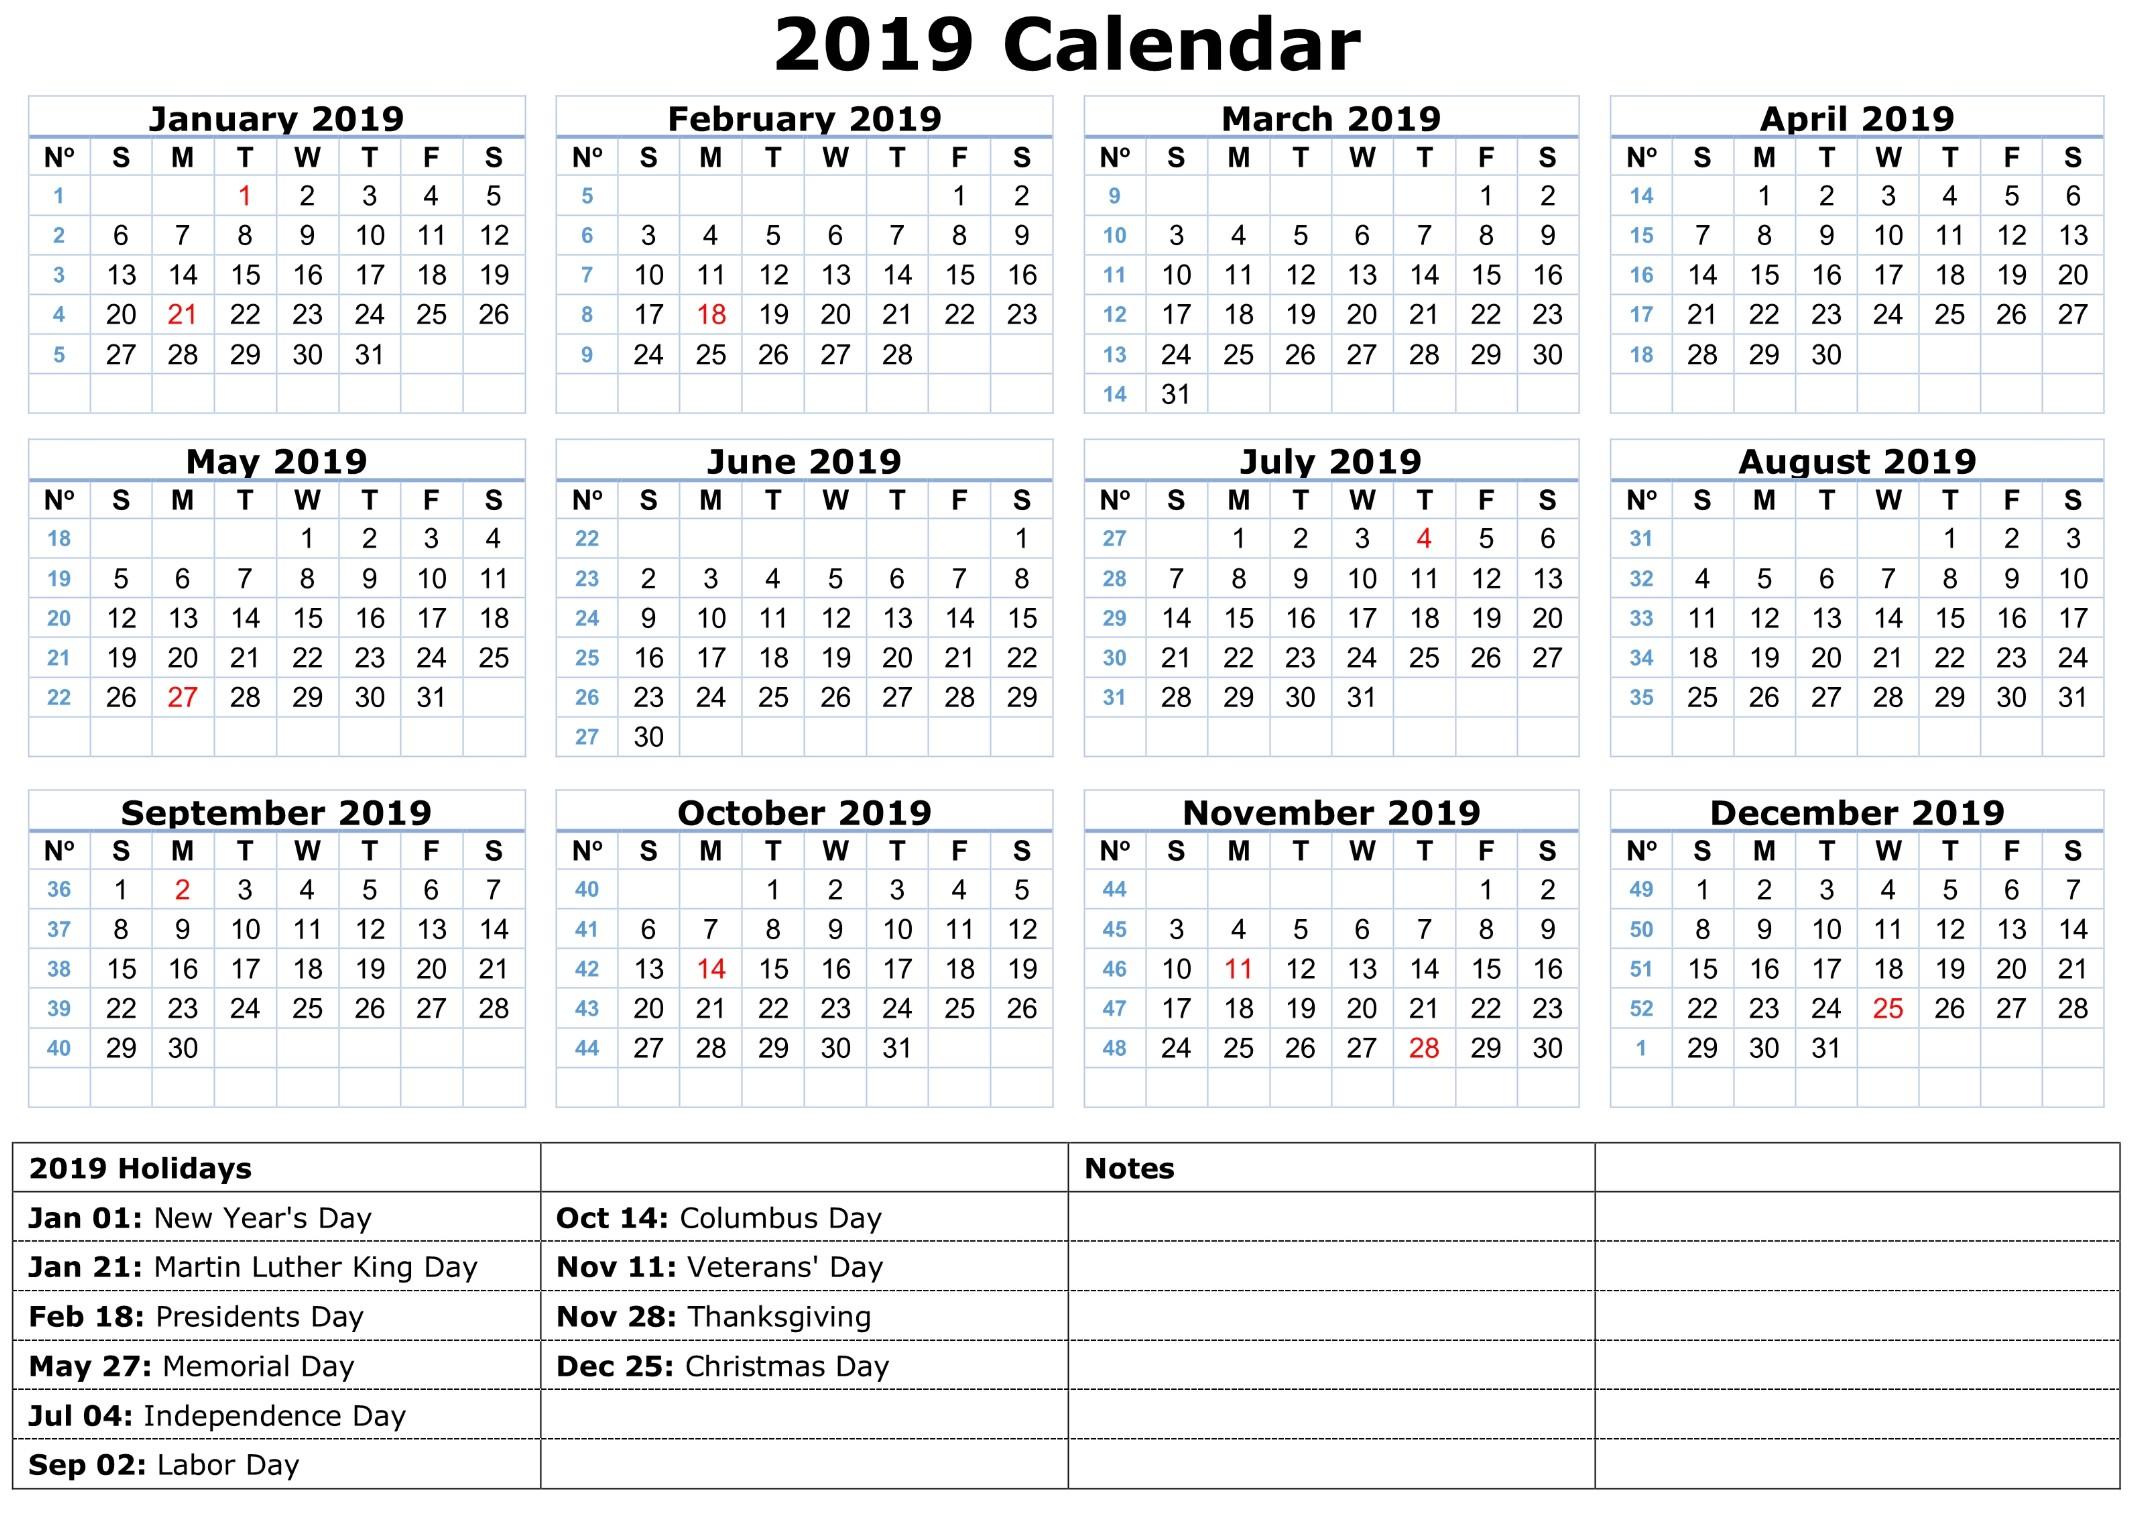 2019 Calendar with Federal Holidays Printable 2019 Calendar Amazonaws